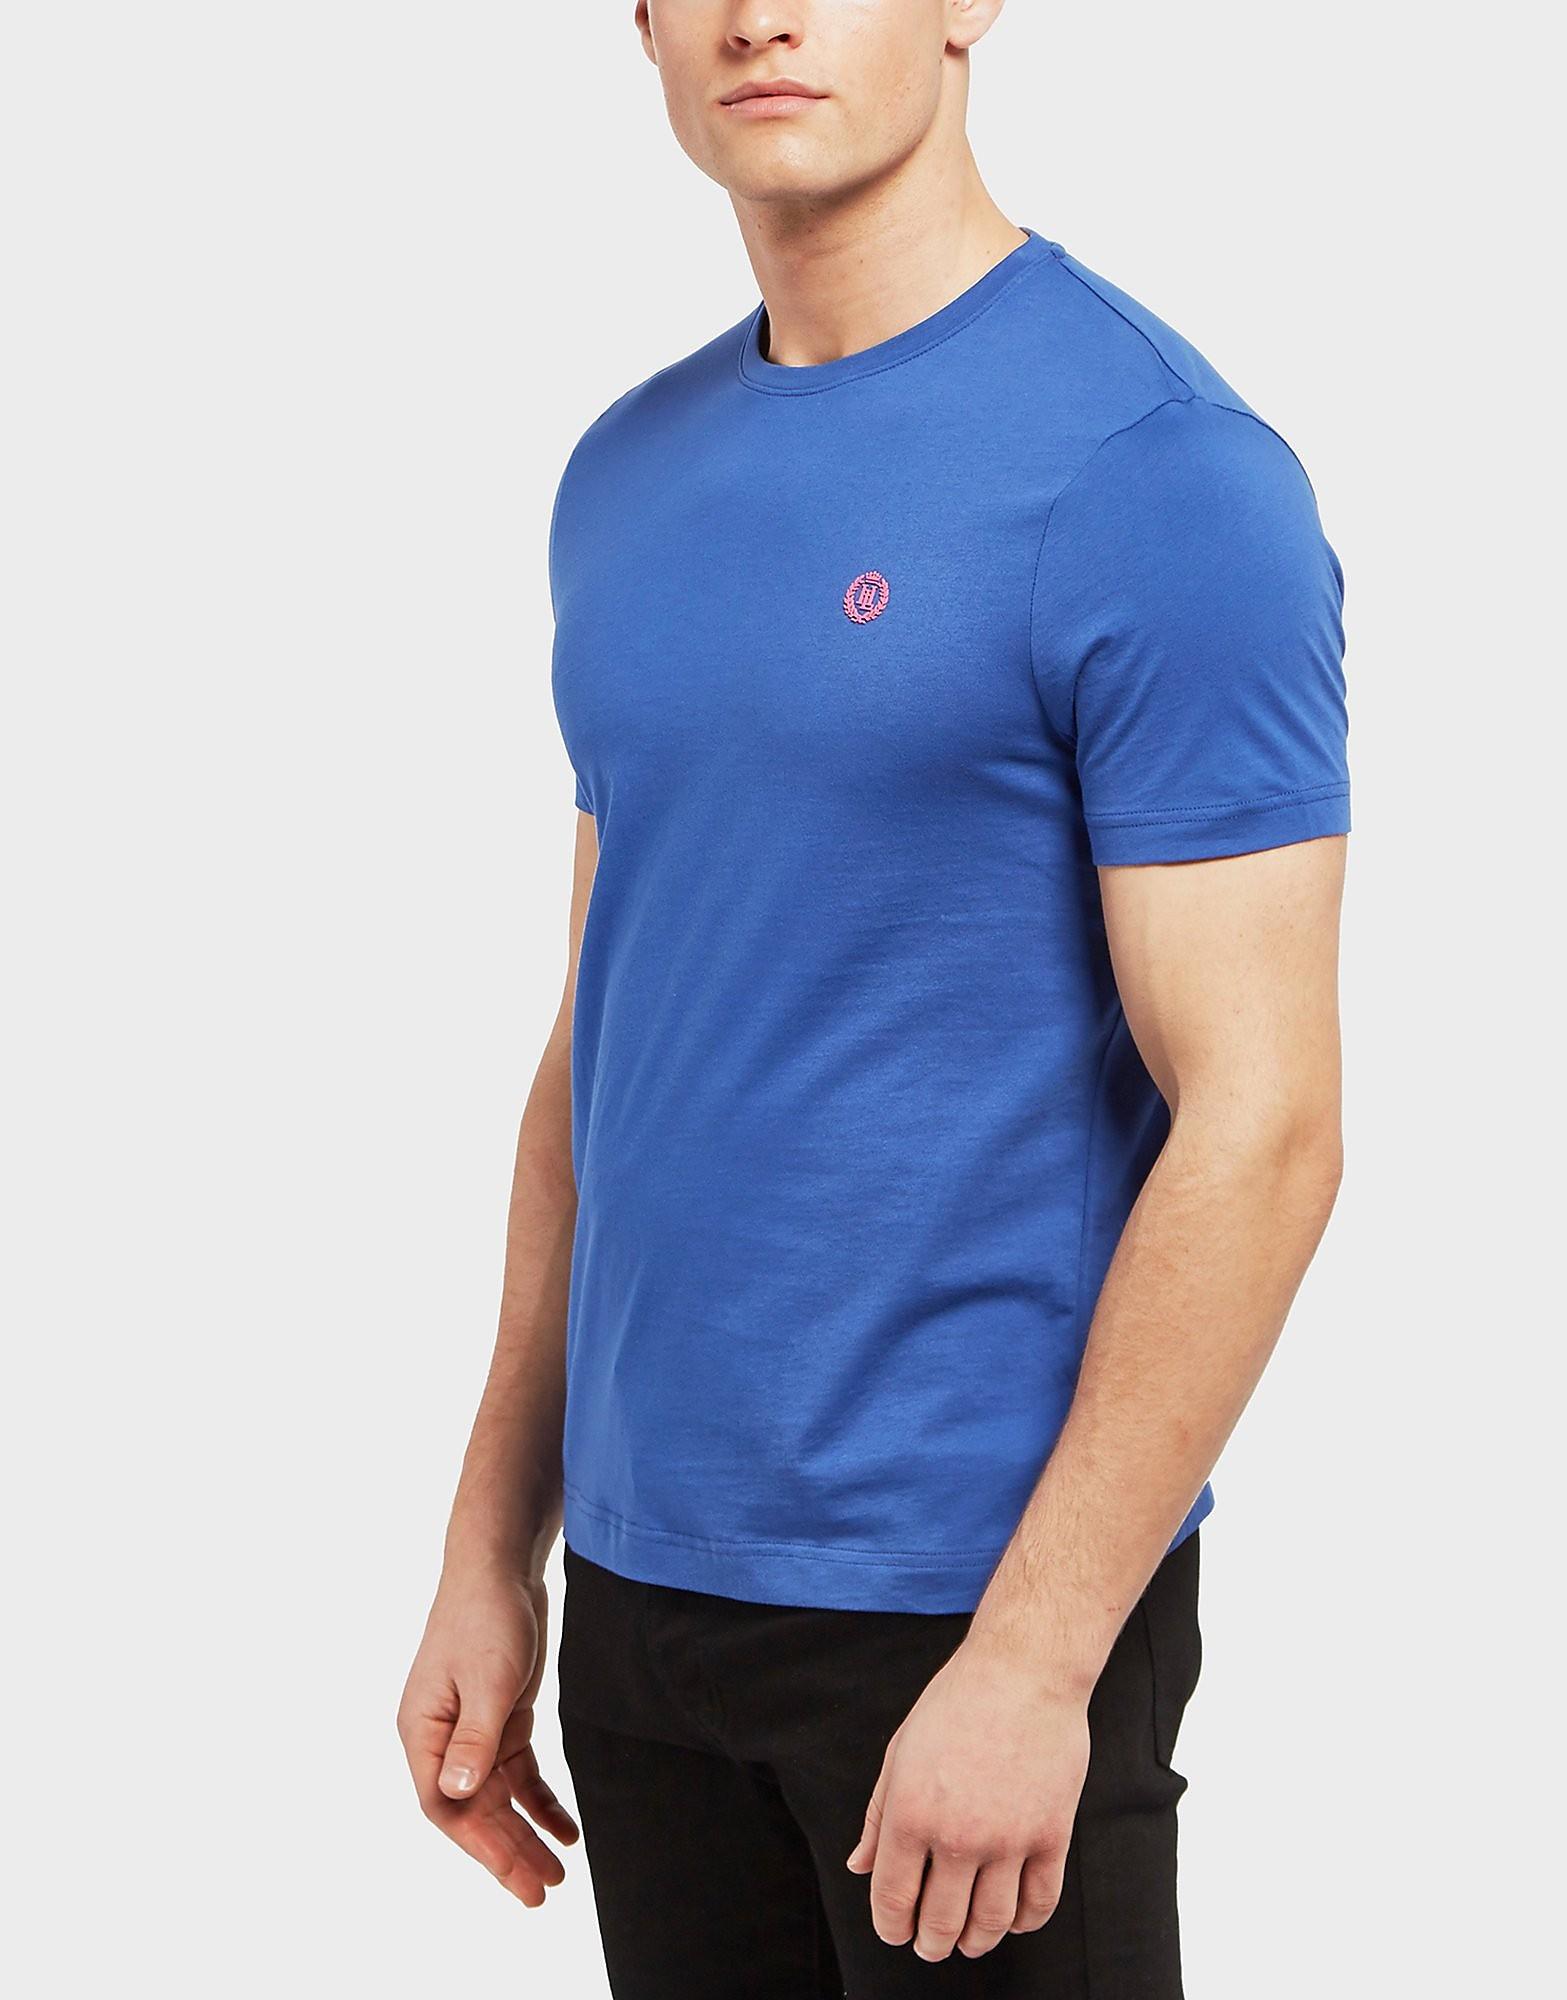 Henri Lloyd Radar Short Sleeve T-Shirt